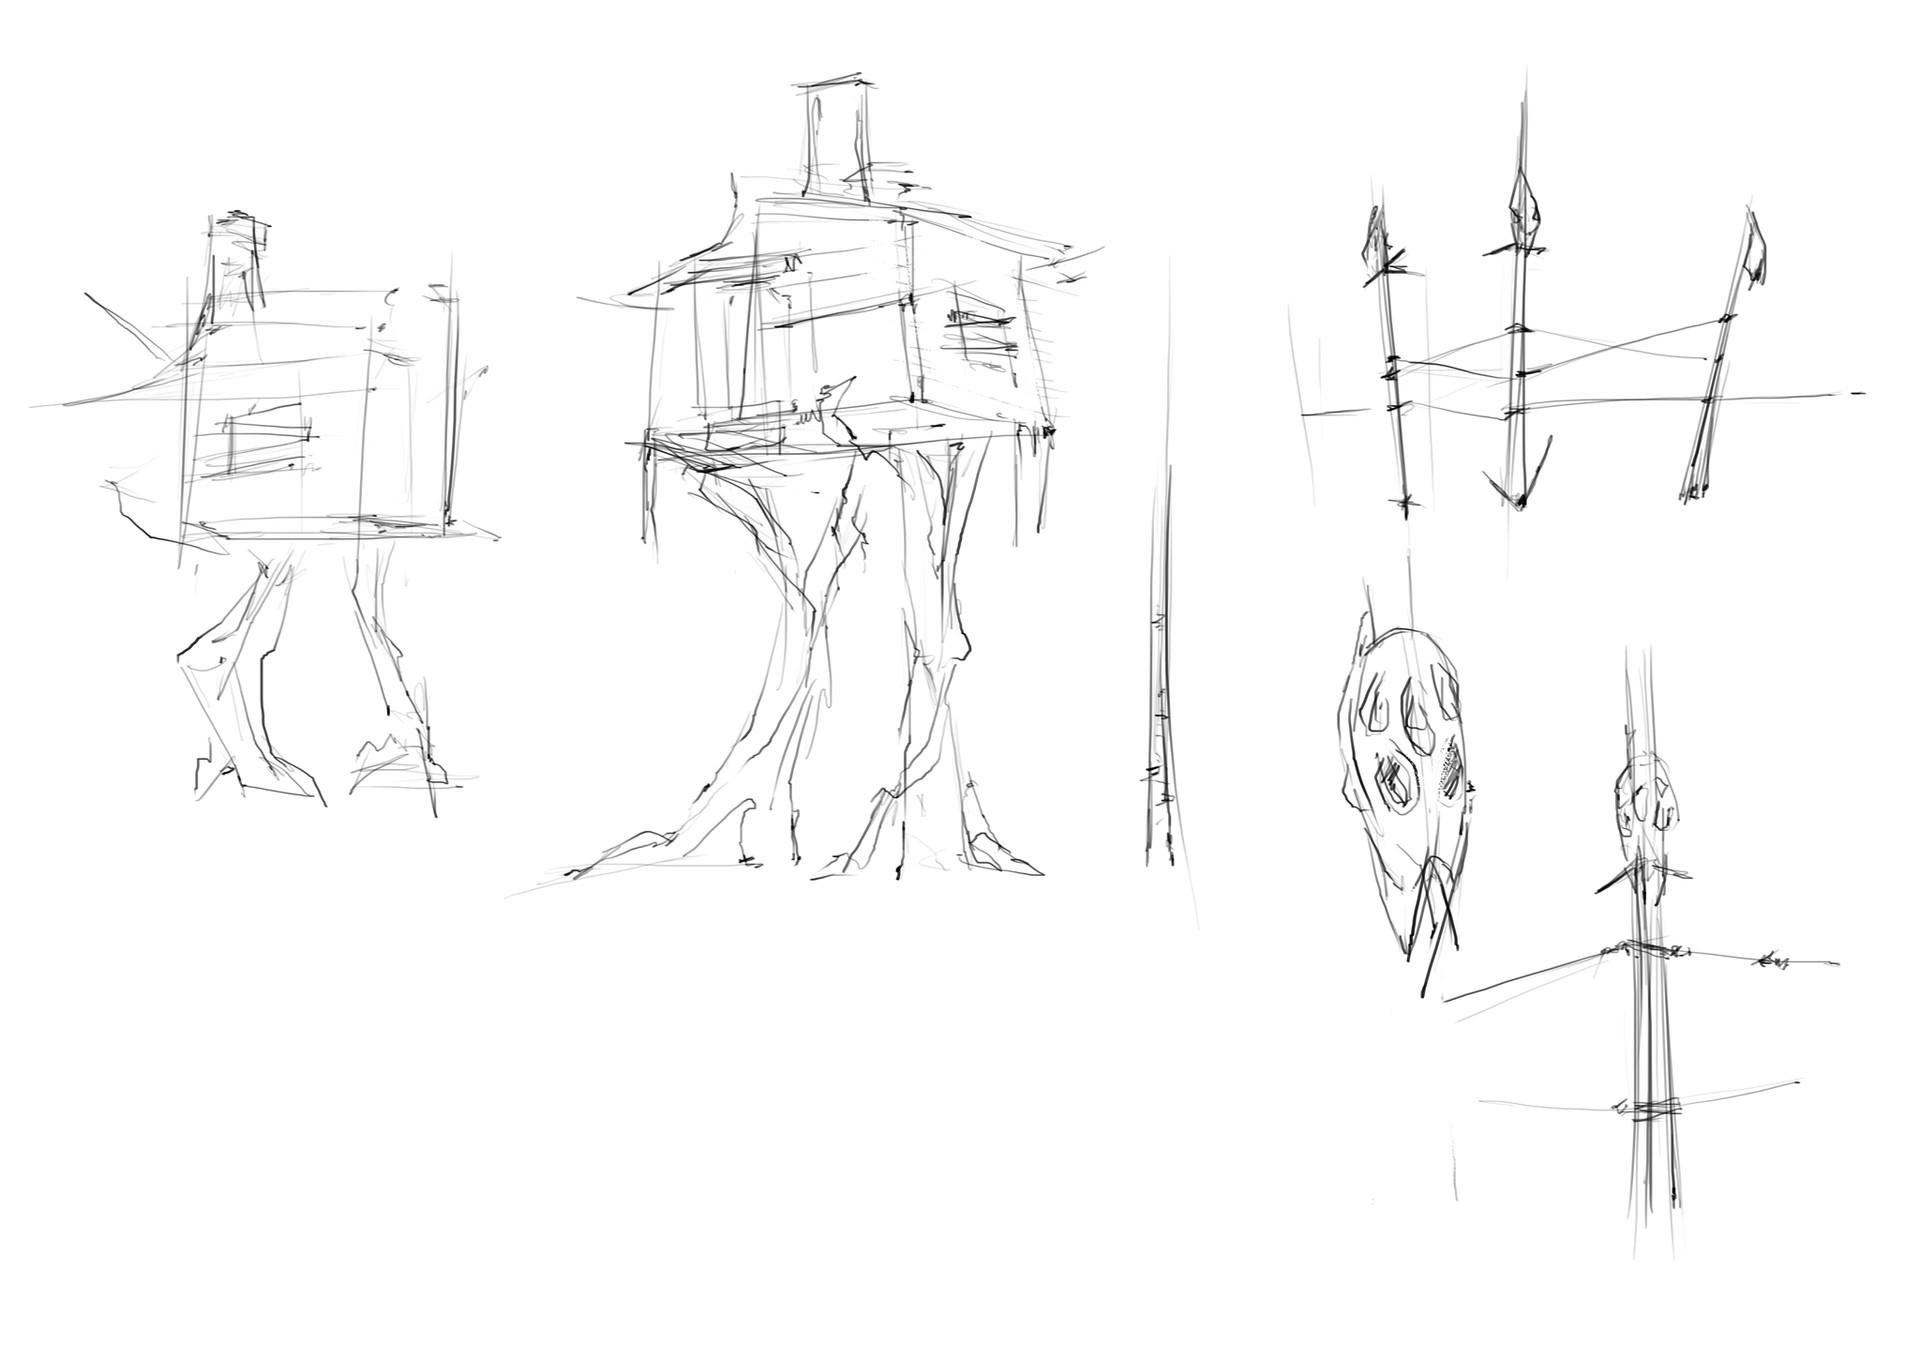 Eyal degabli xtra 01 sketches